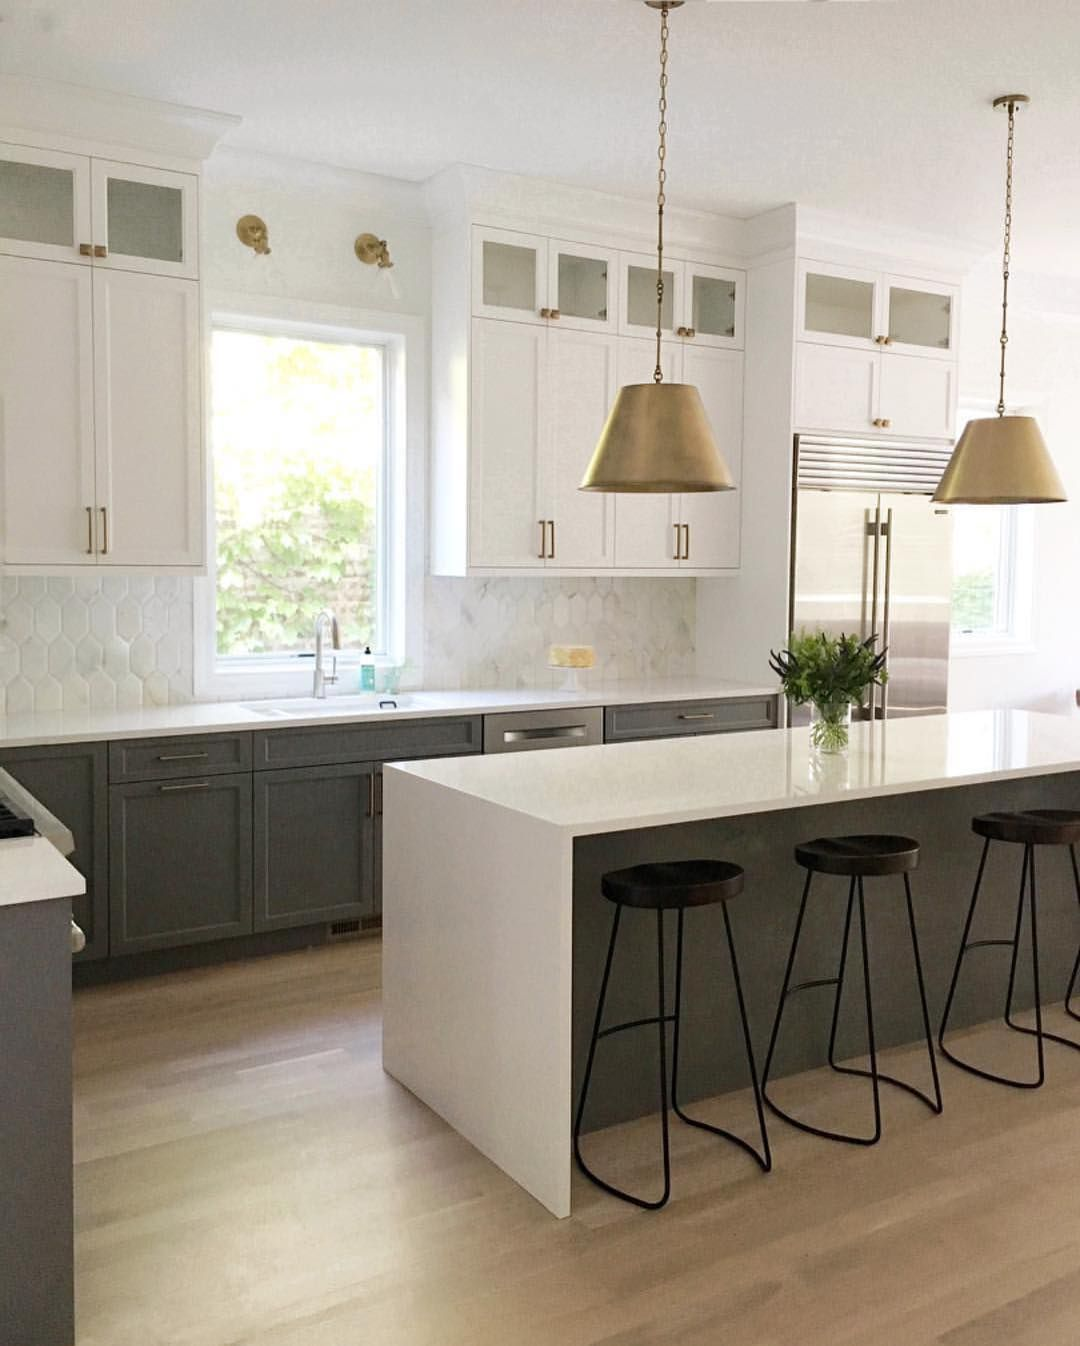 Interior Designed Kitchens Instagram Photointerior Design  Unique Interiors And Kitchens